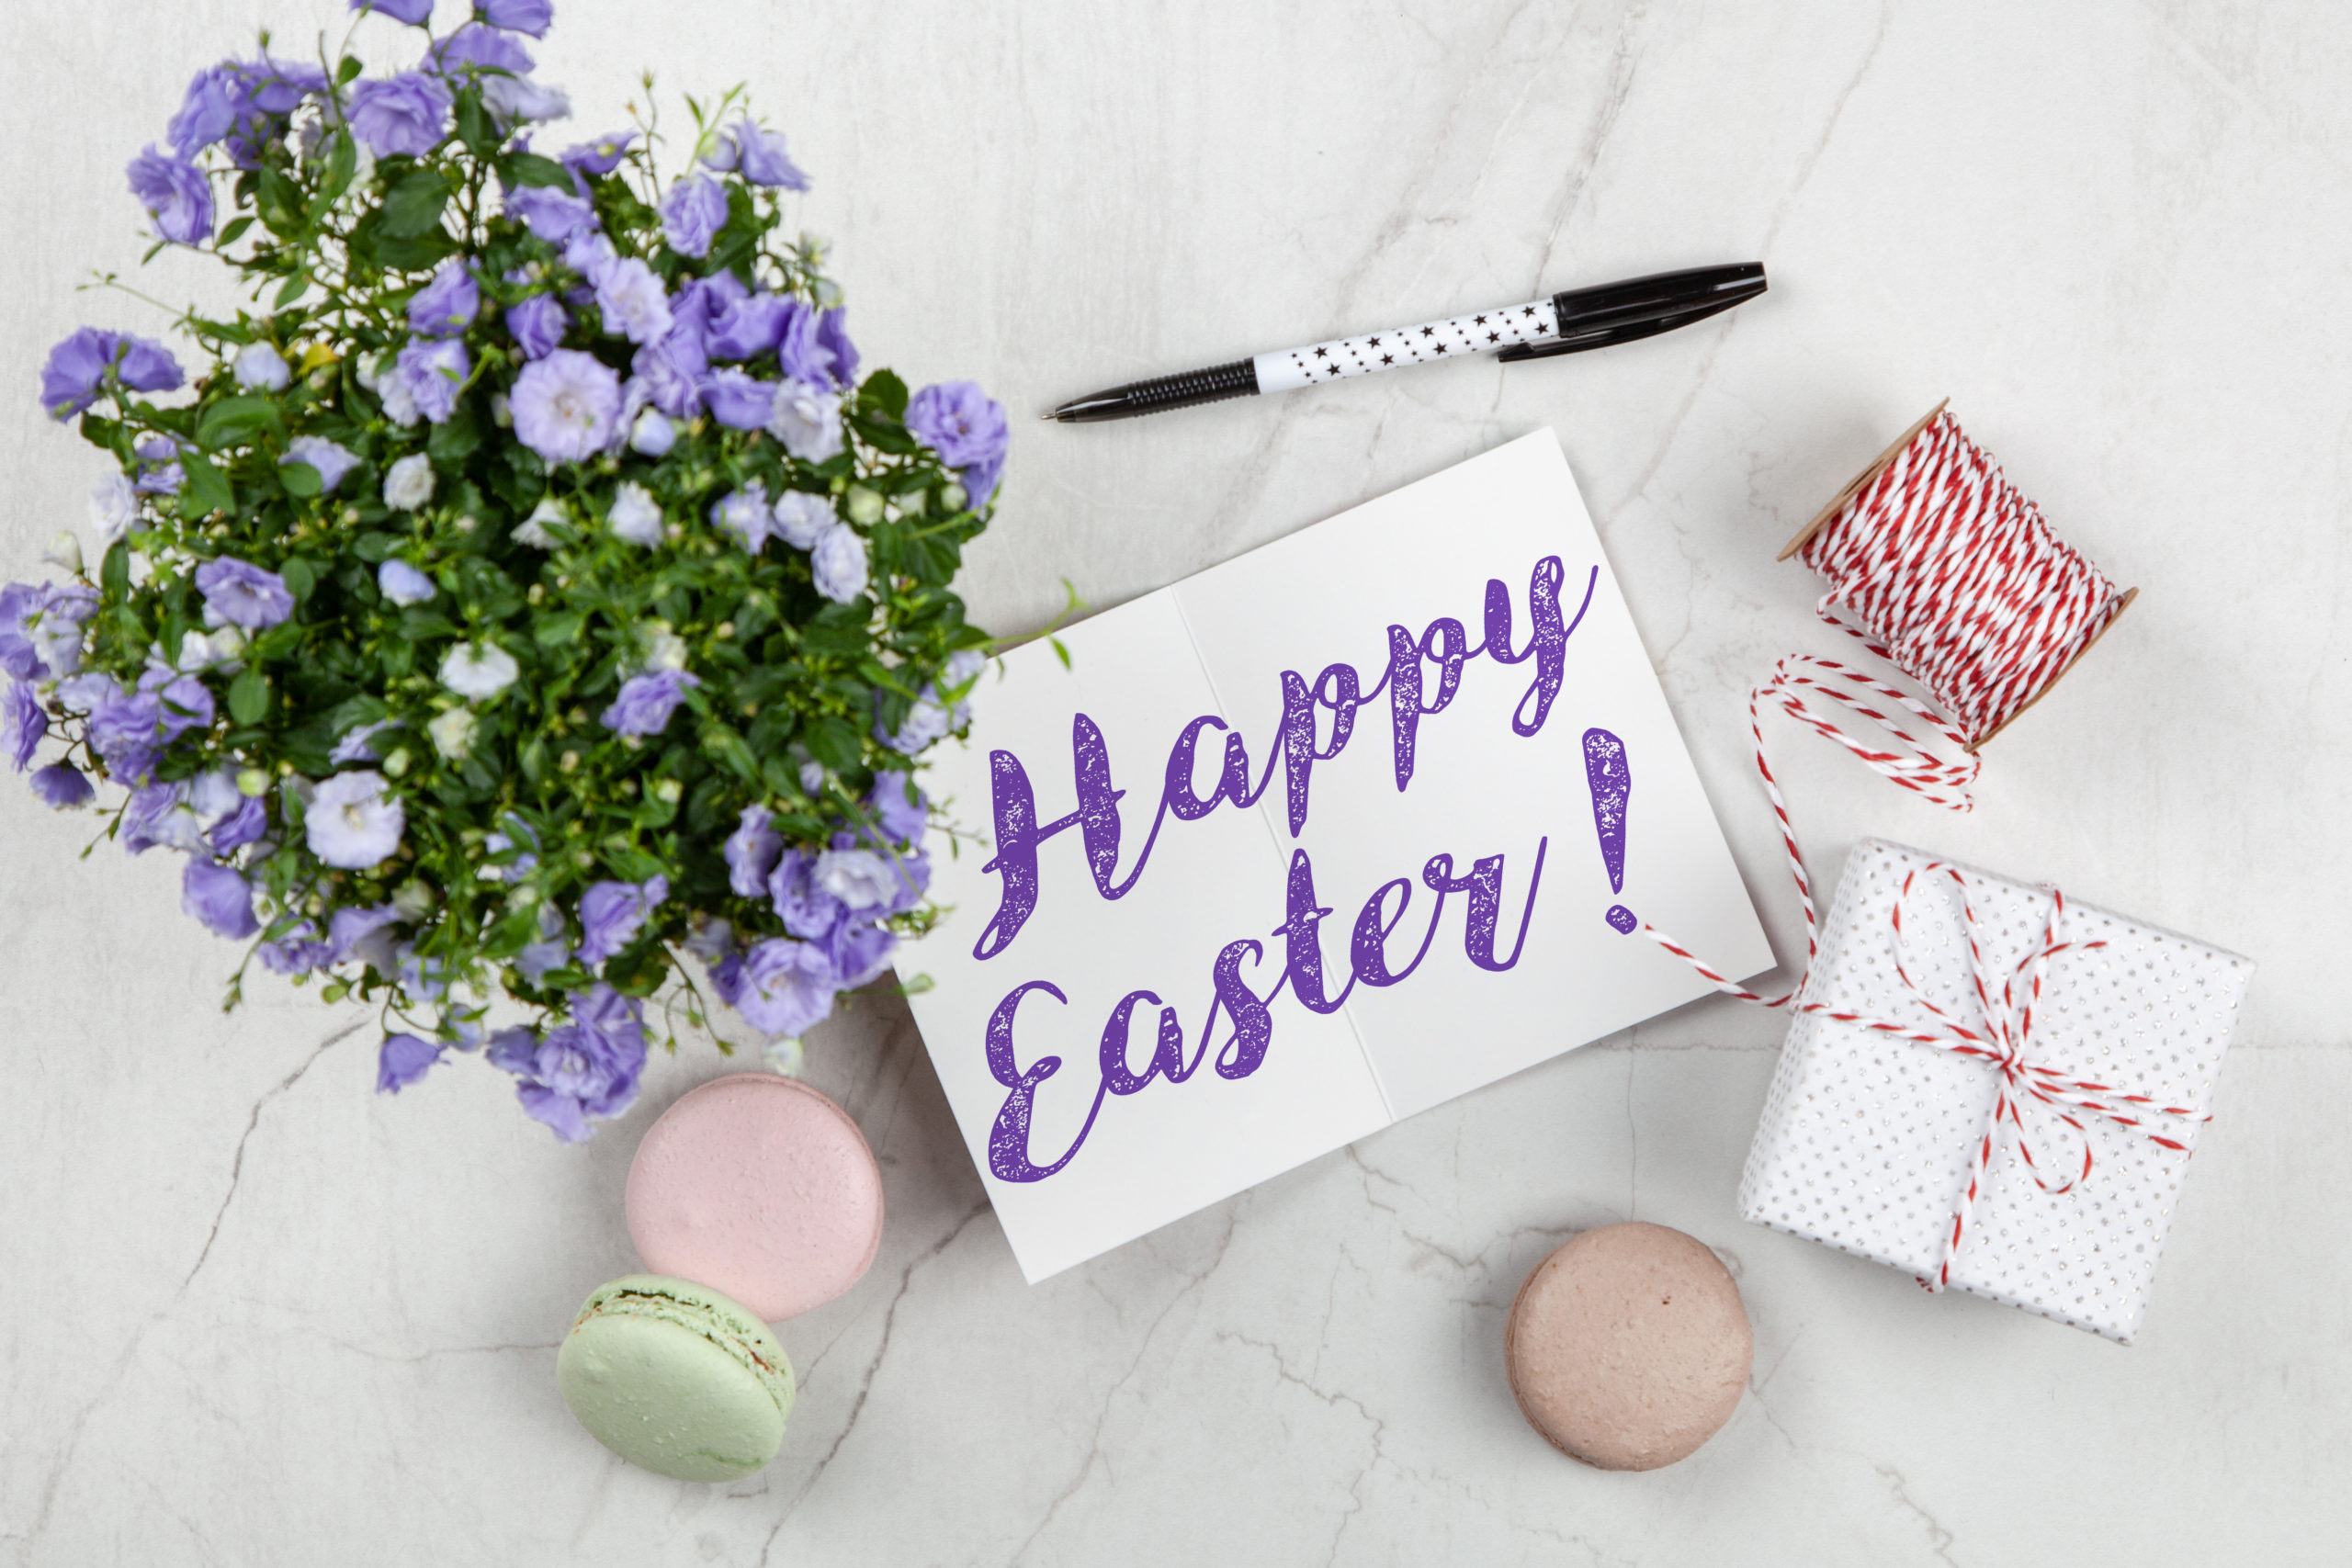 ¿Cómo se Celebra la Pascua en los Países de Habla Inglesa?